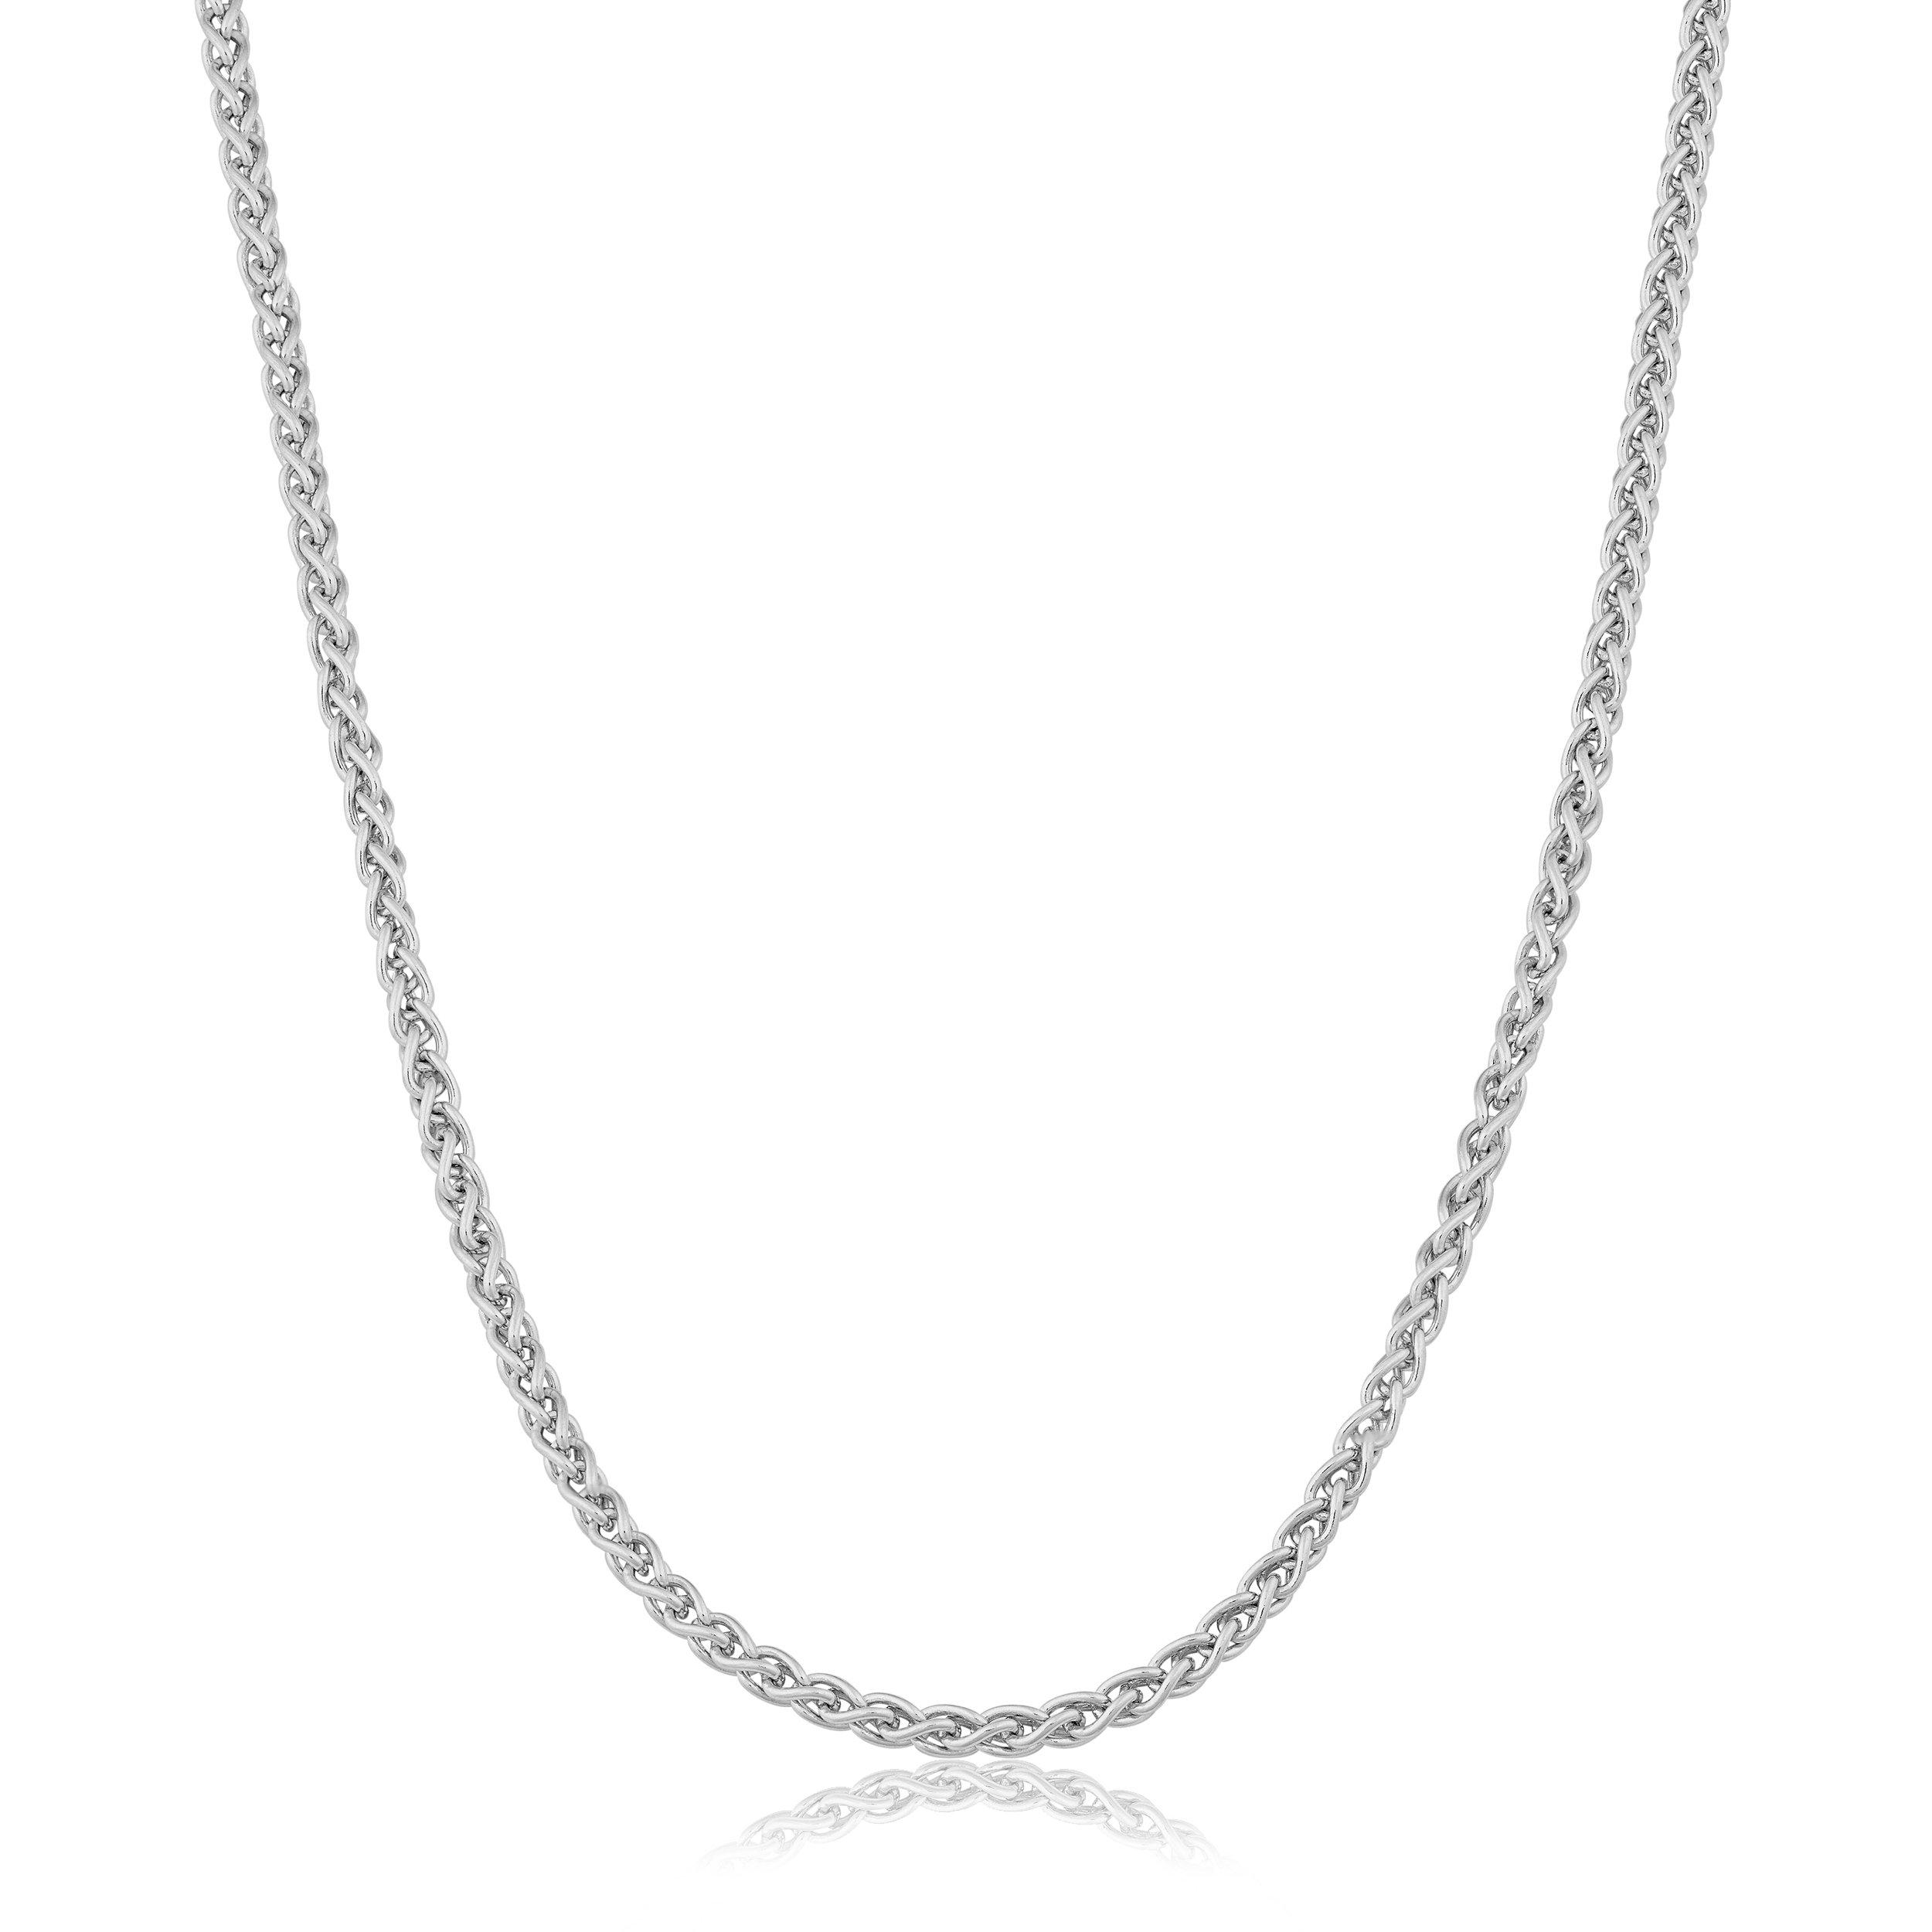 Kooljewelry Sterling Silver 1.5-mm Round Wheat Chain (24 Inch)